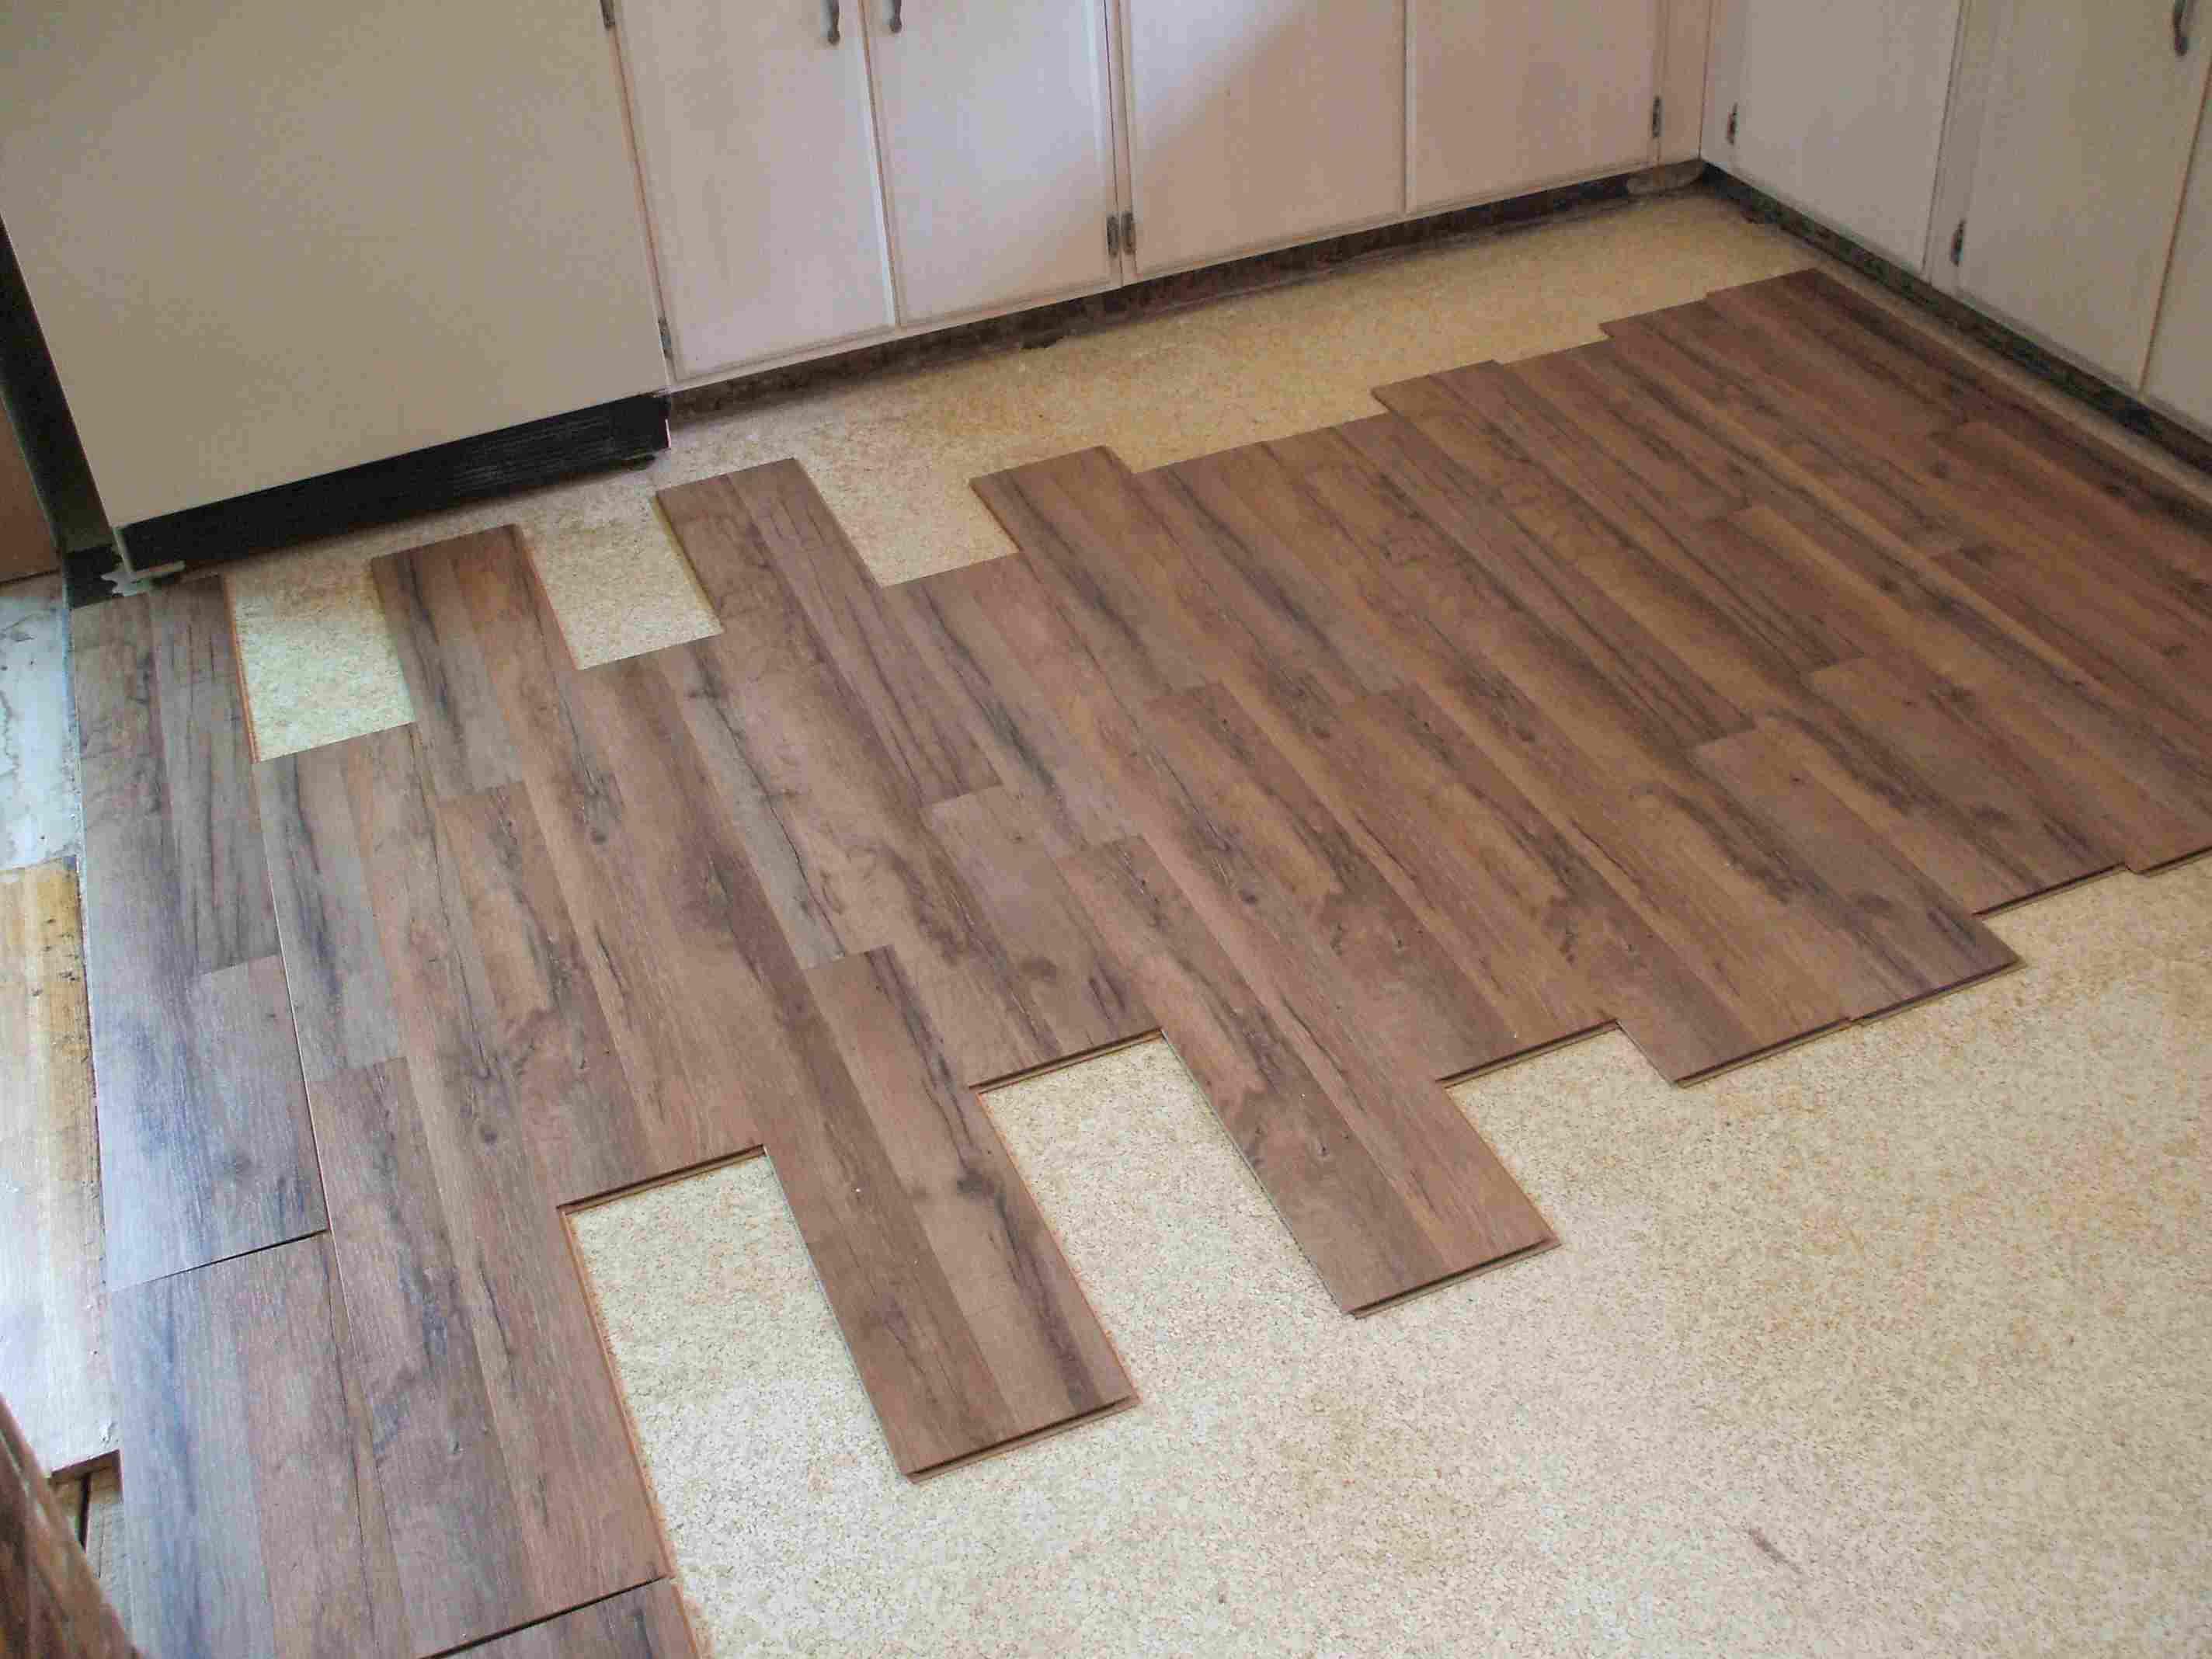 hardwood floor layout calculator of laminate flooring installation made easy inside installing laminate eyeballing layout 56a49d075f9b58b7d0d7d693 jpg